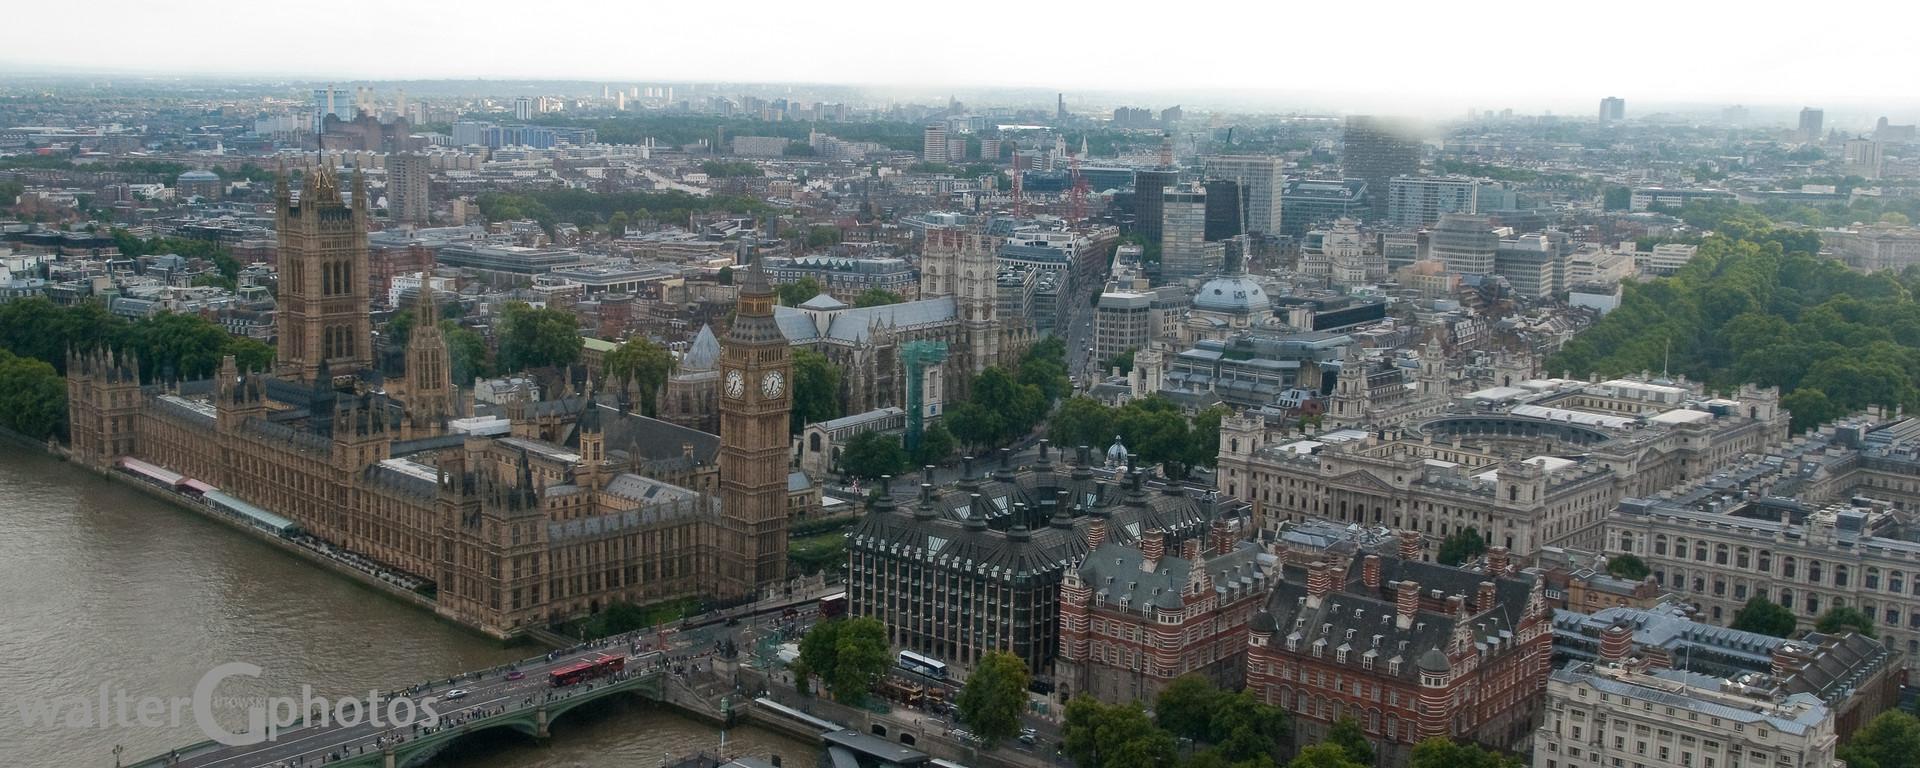 London Cityscape with Parliament Buildings, London, UK